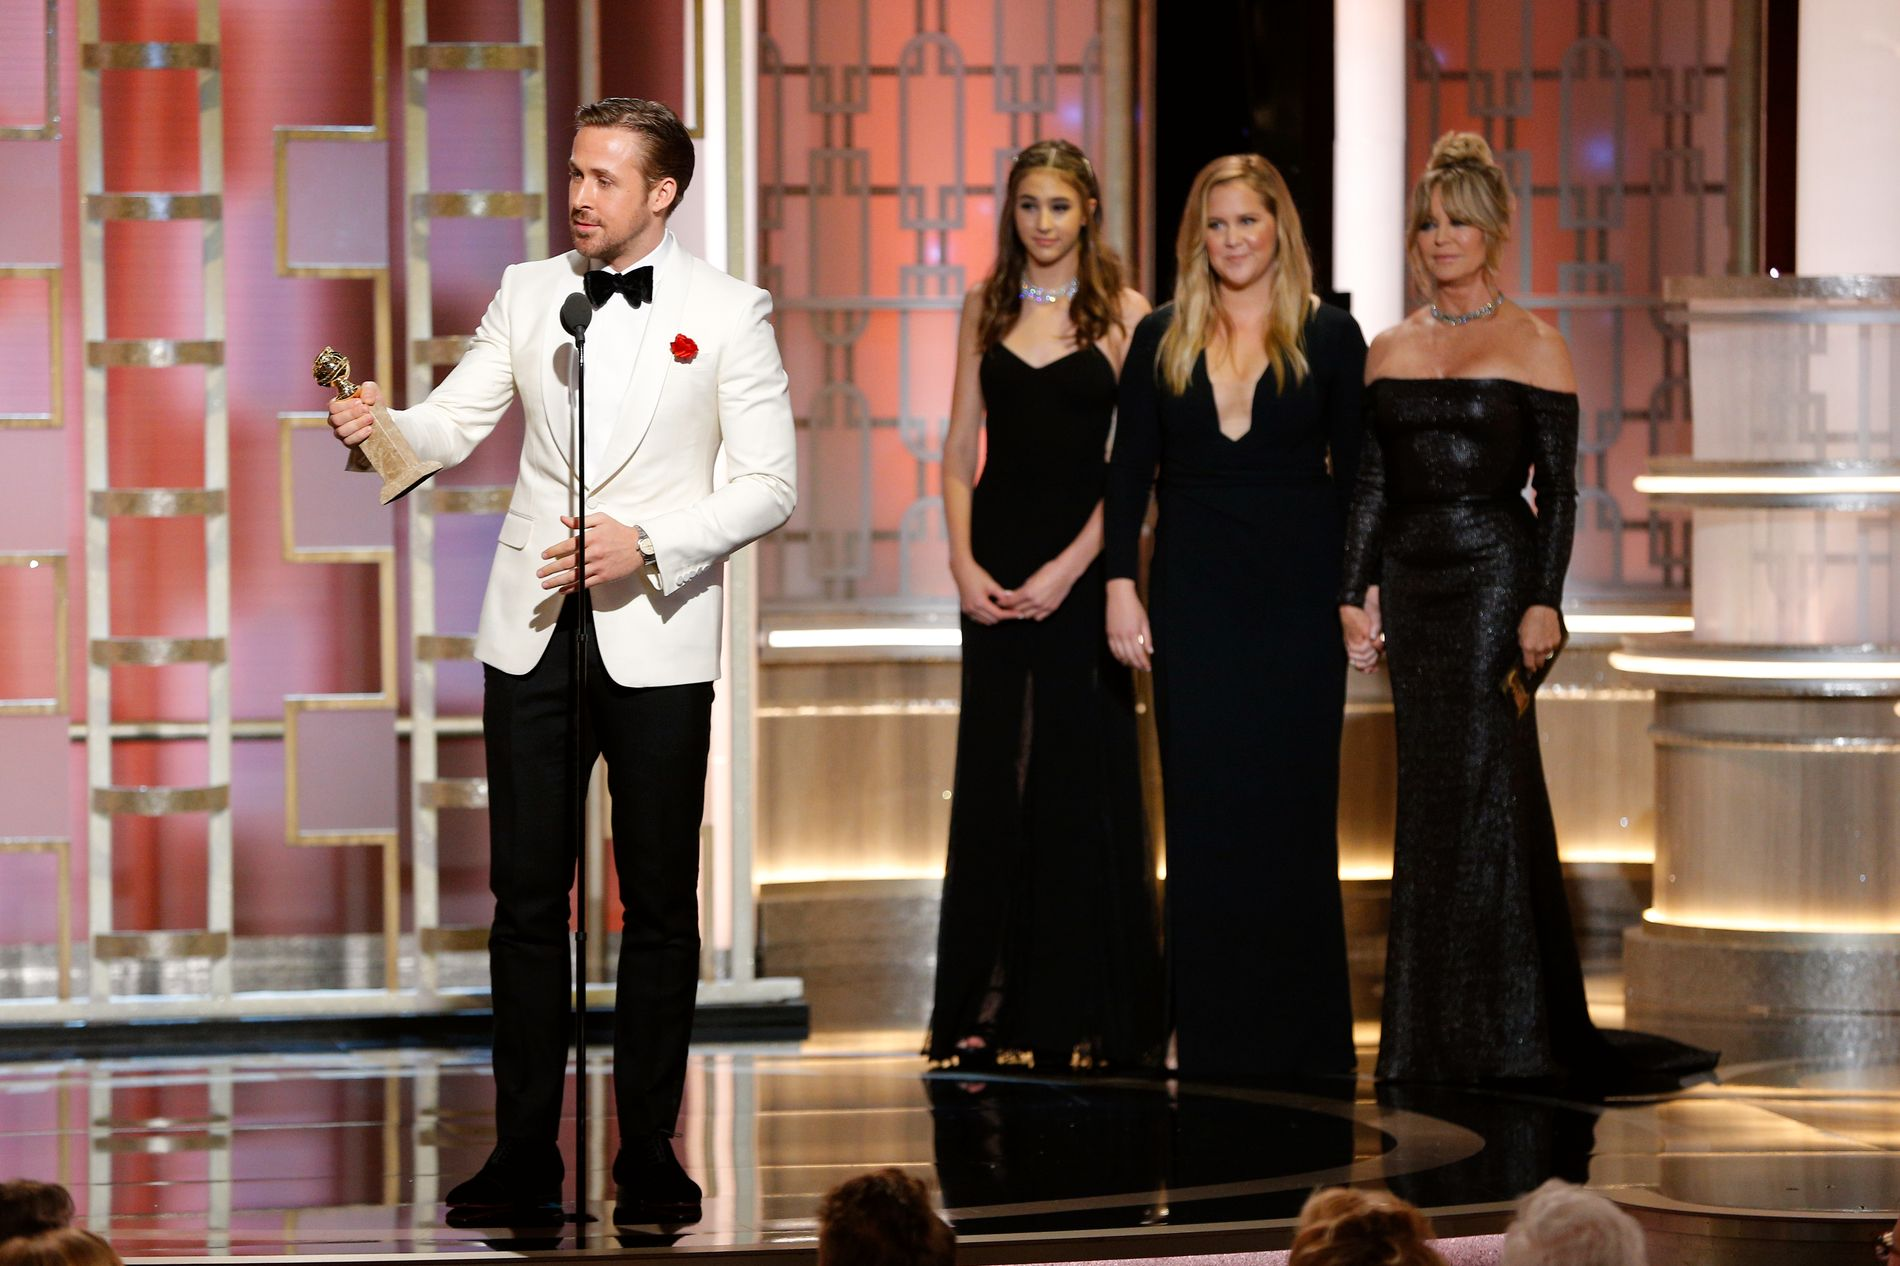 RØRTE SALEN: Ryan Gosling hyllet sin kjære under takketalen da han vant årets mannlige hovedrolle i kategorien musikal/komedie-film.